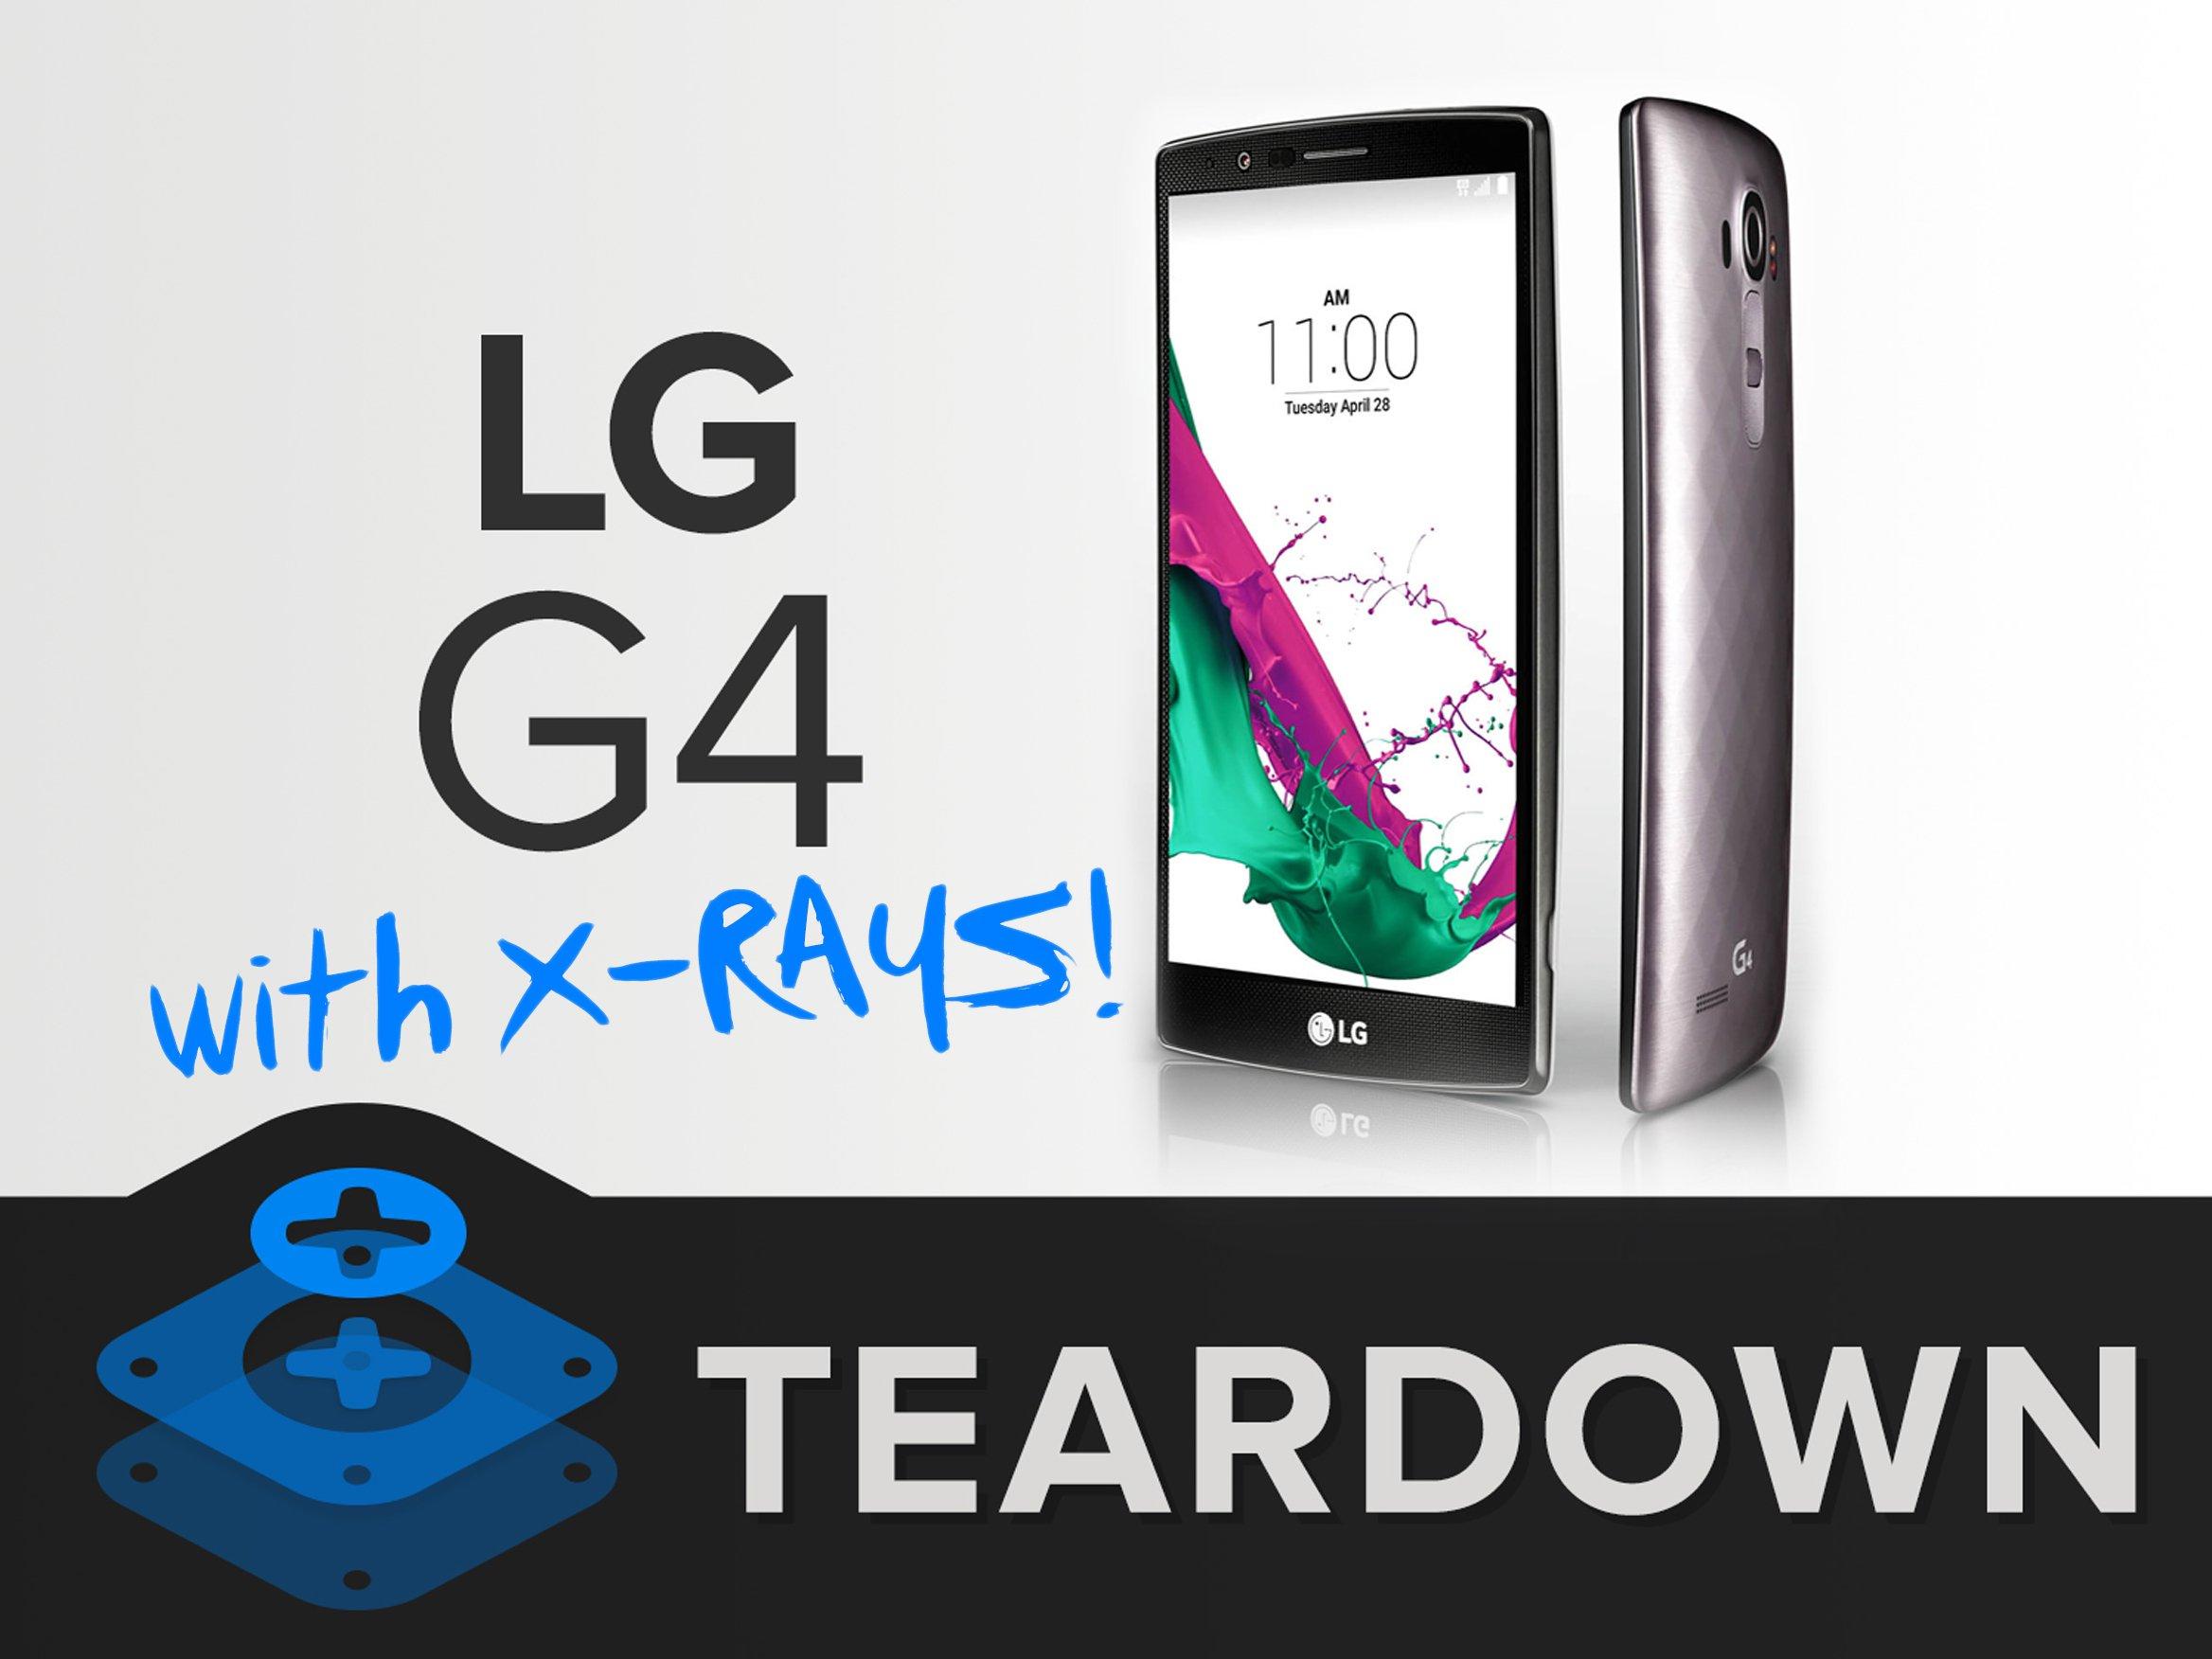 LG G4 Teardown - iFixit